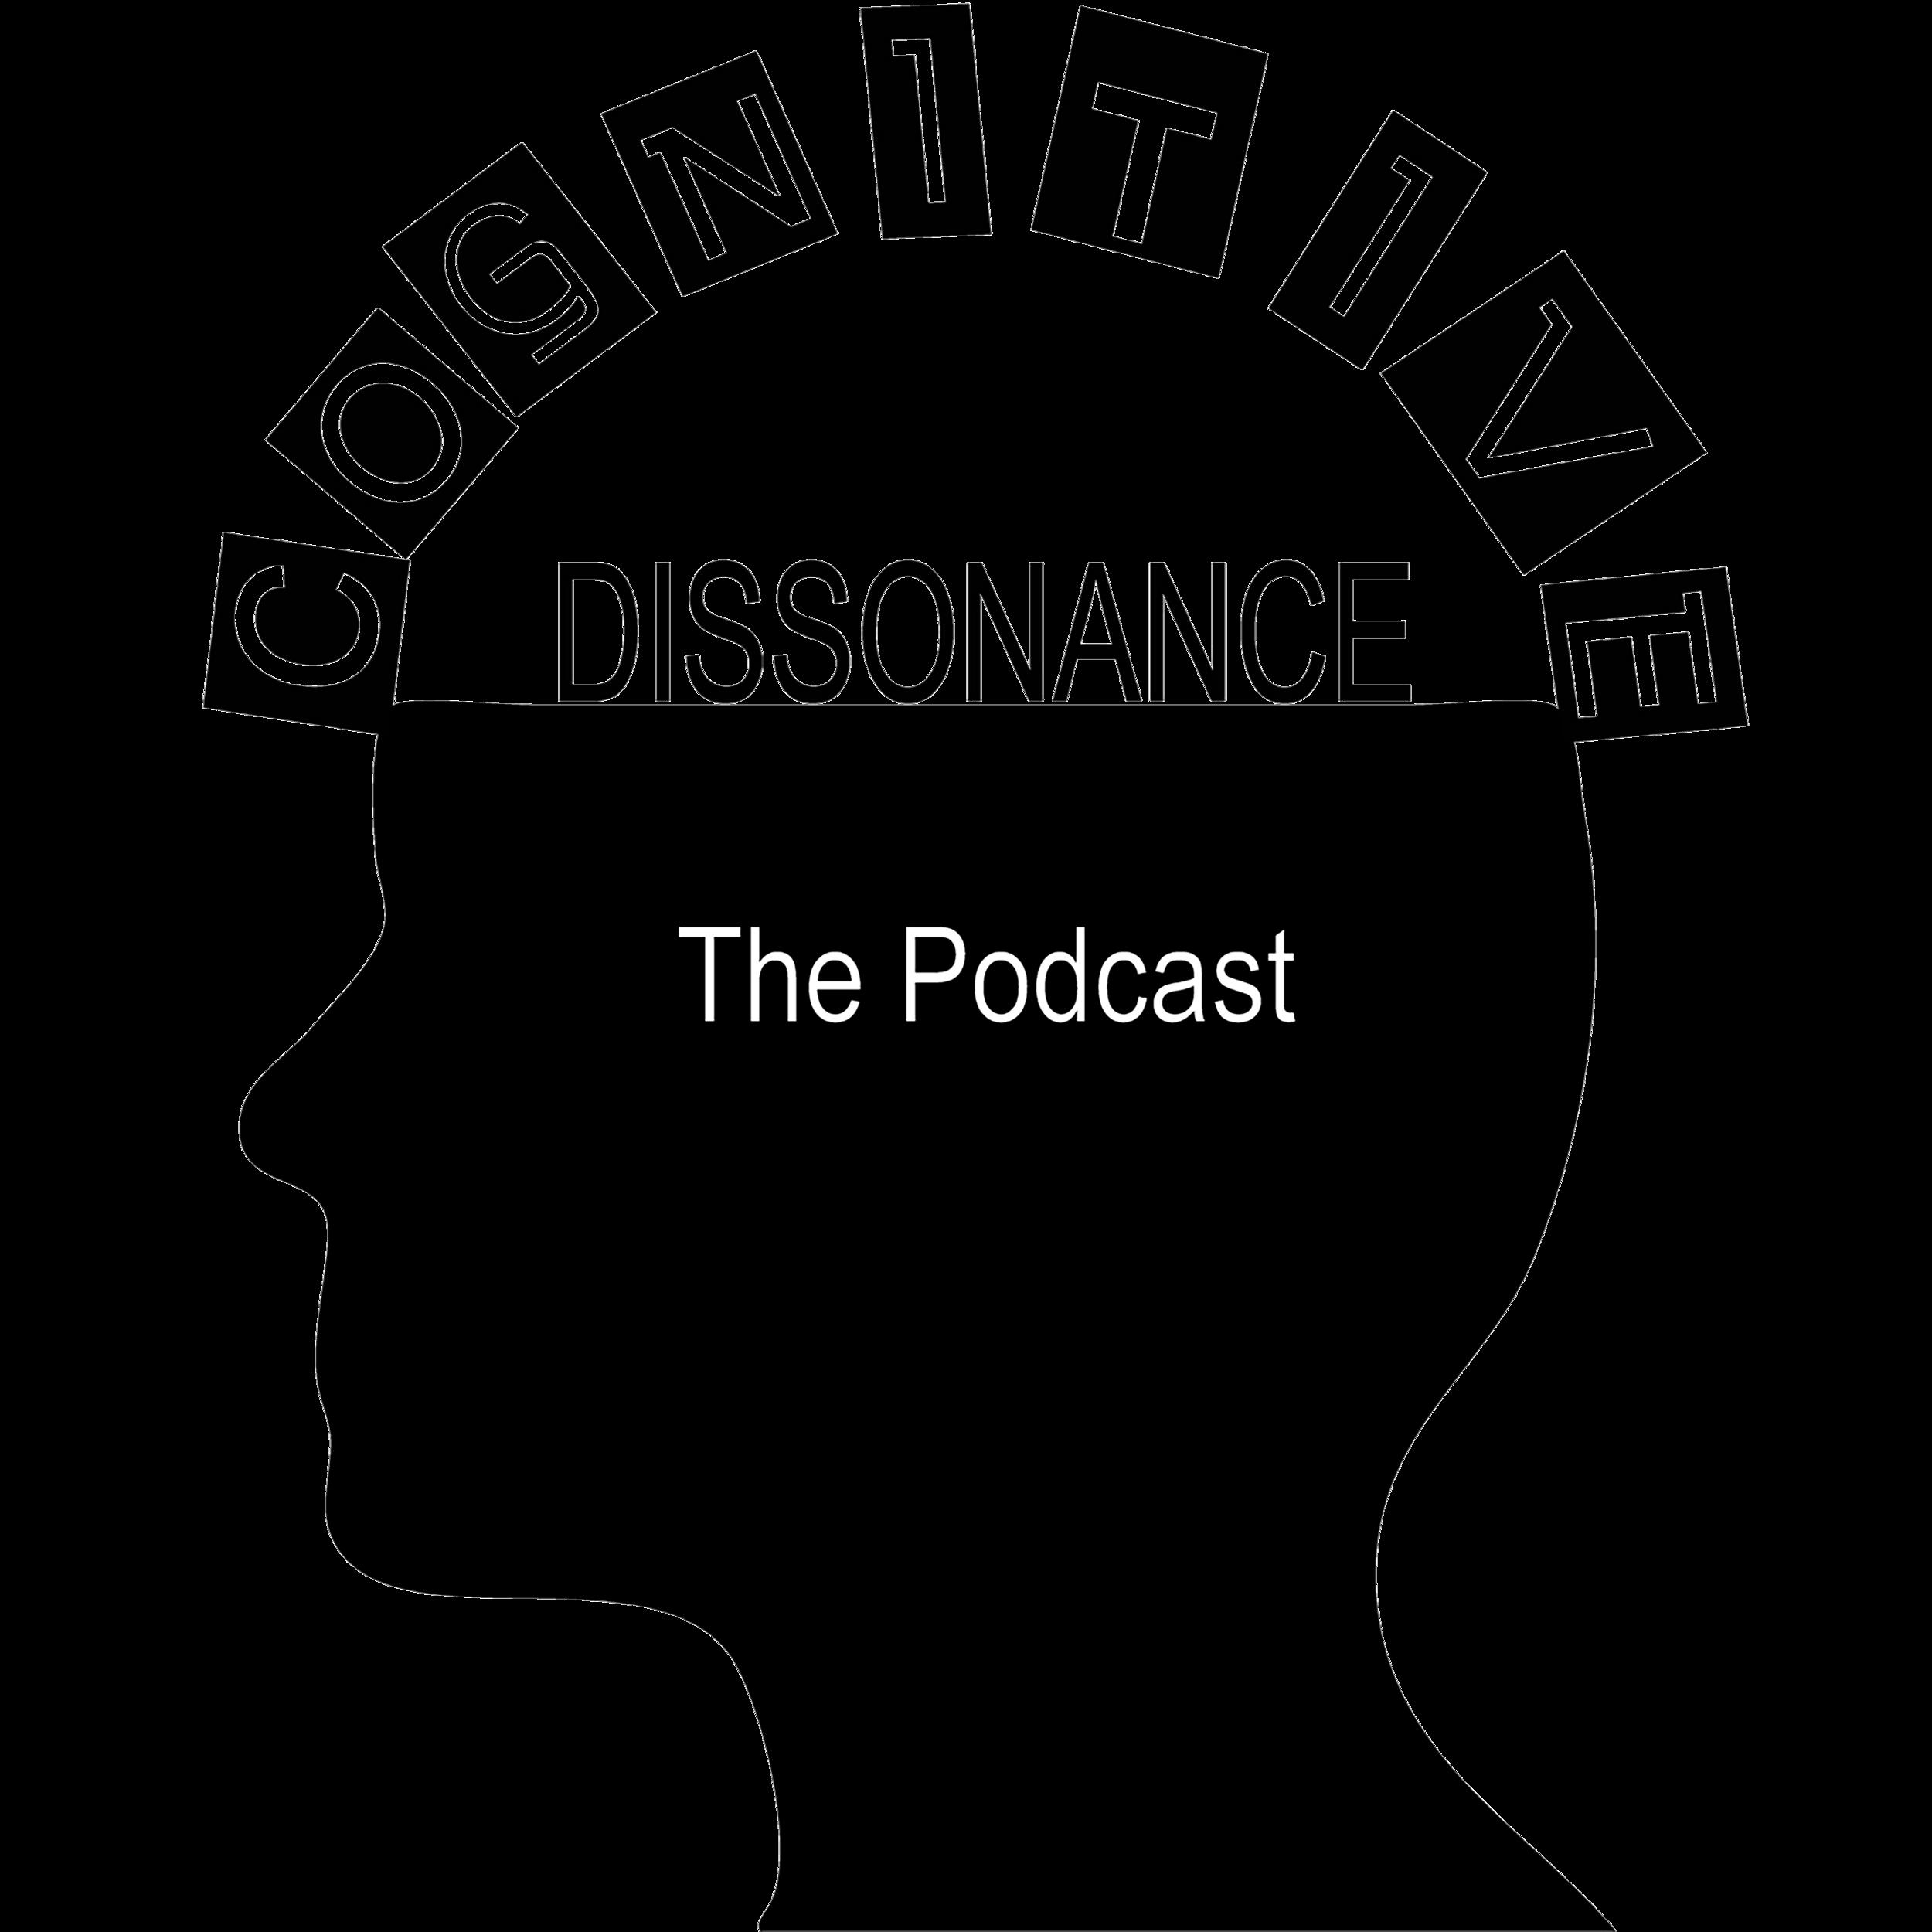 Cognitive_Dissonance_Logo (1).png